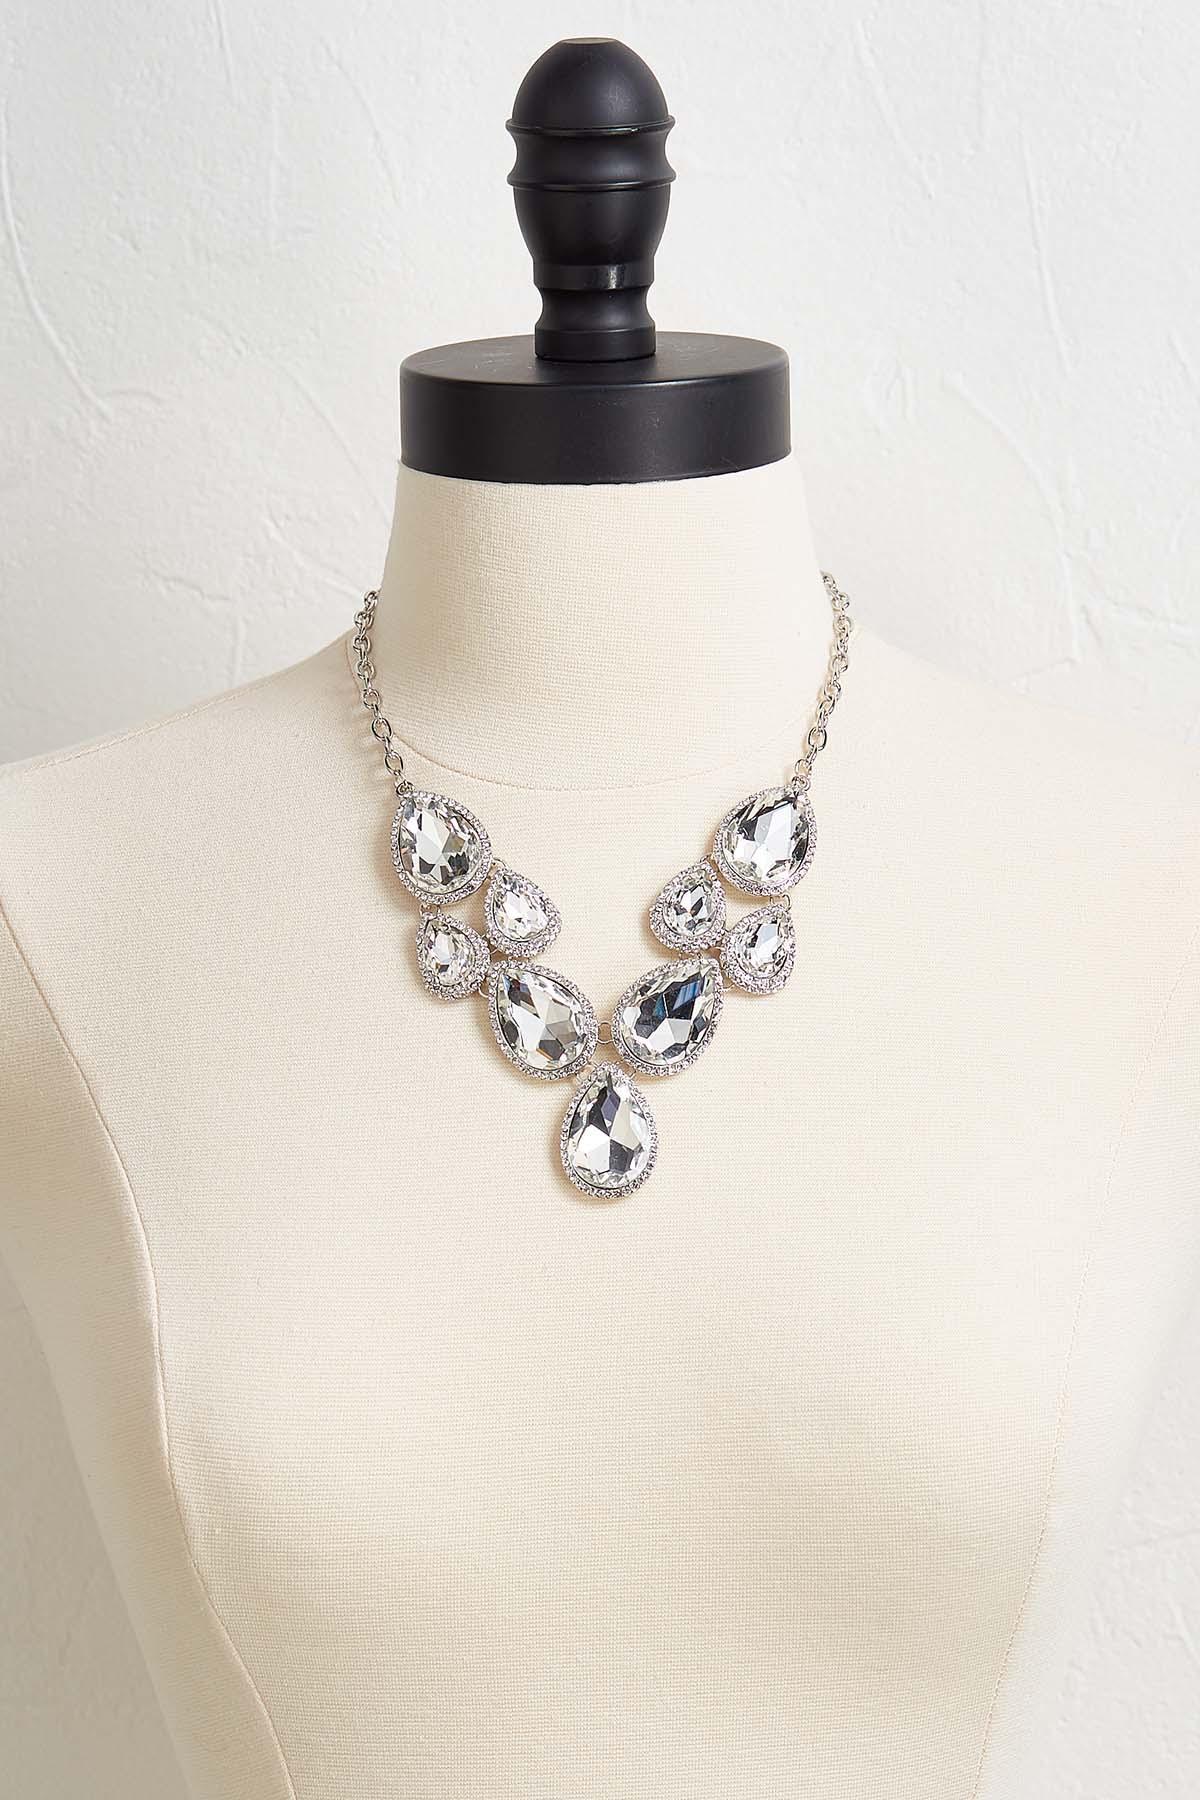 Tear Shaped Stone Bib Necklace